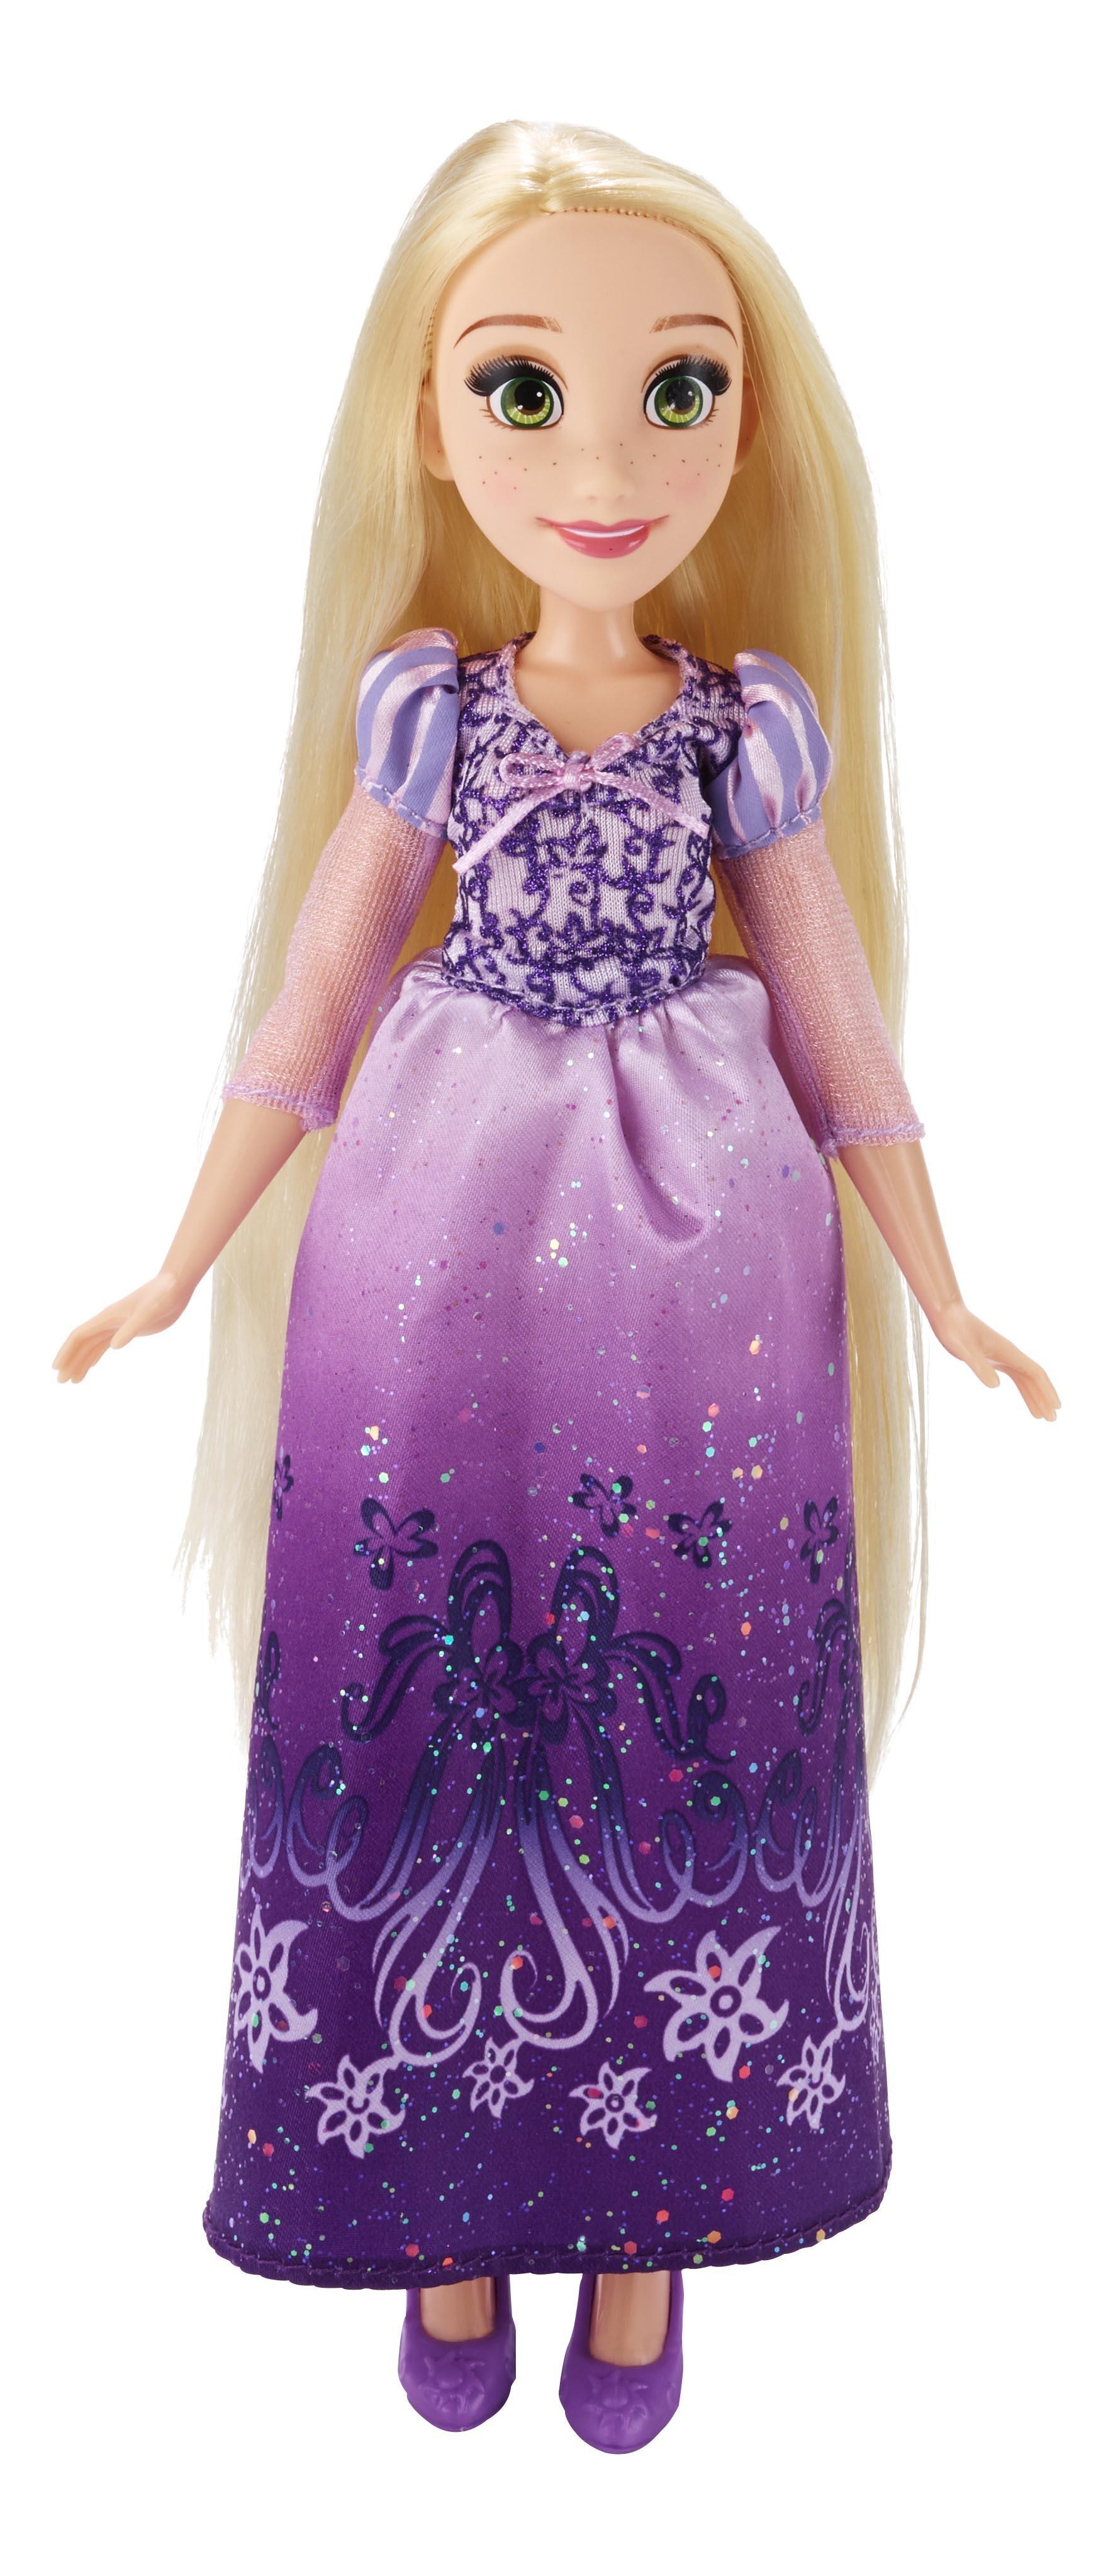 Кукла Disney Royal Shimmer Королевский блеск Рапунцель